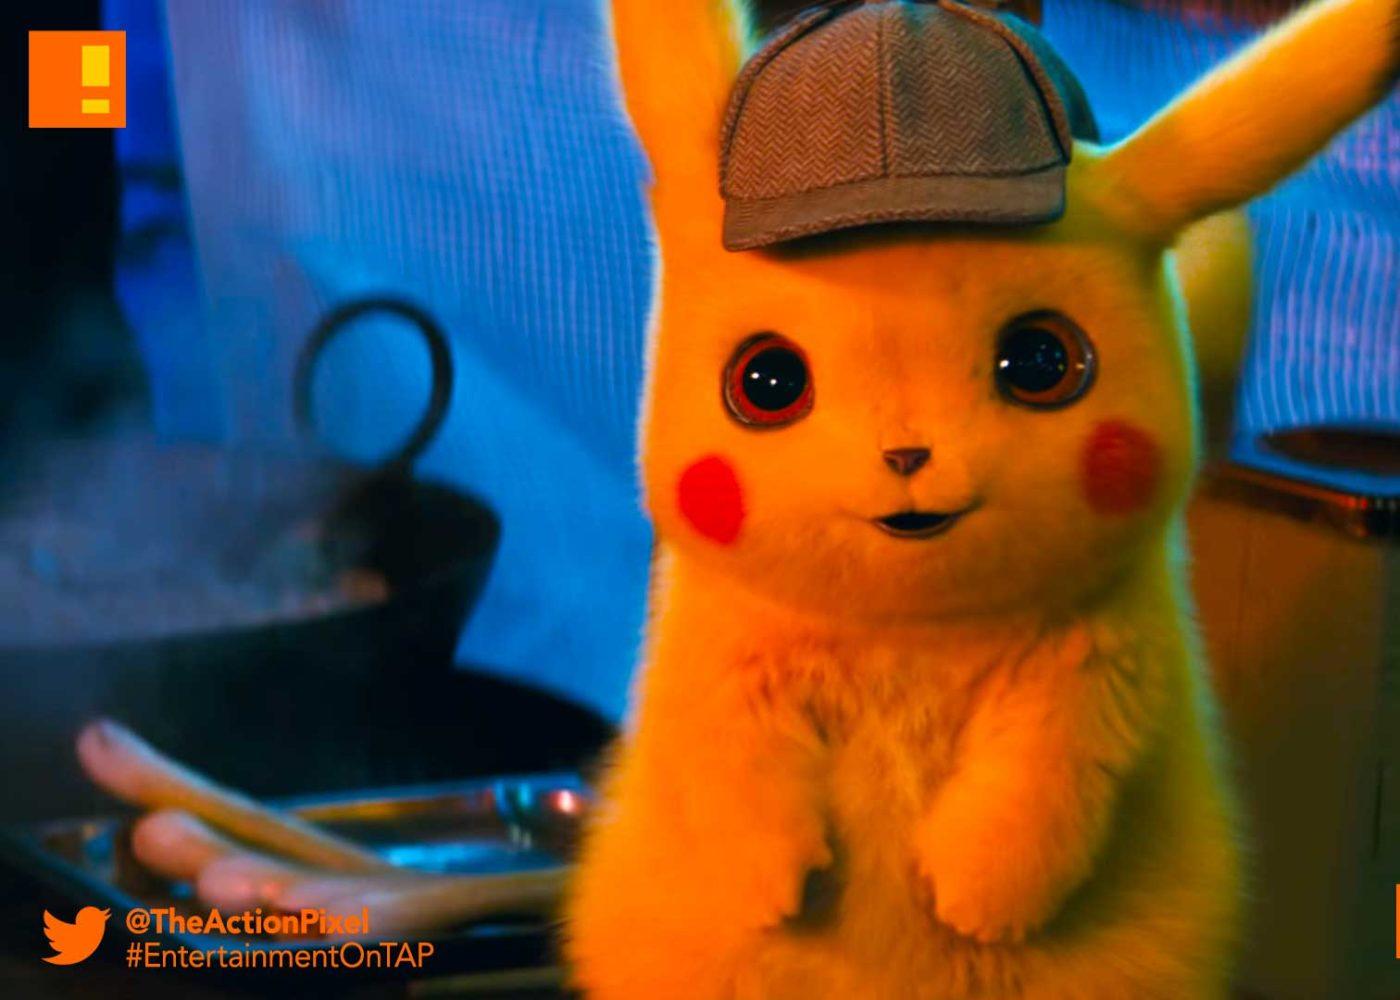 POKÉMON Detective Pikachu, pokemon, pokémon, legendary pictures, warner bros. pictures, ryan reynolds, entertainment on tap,